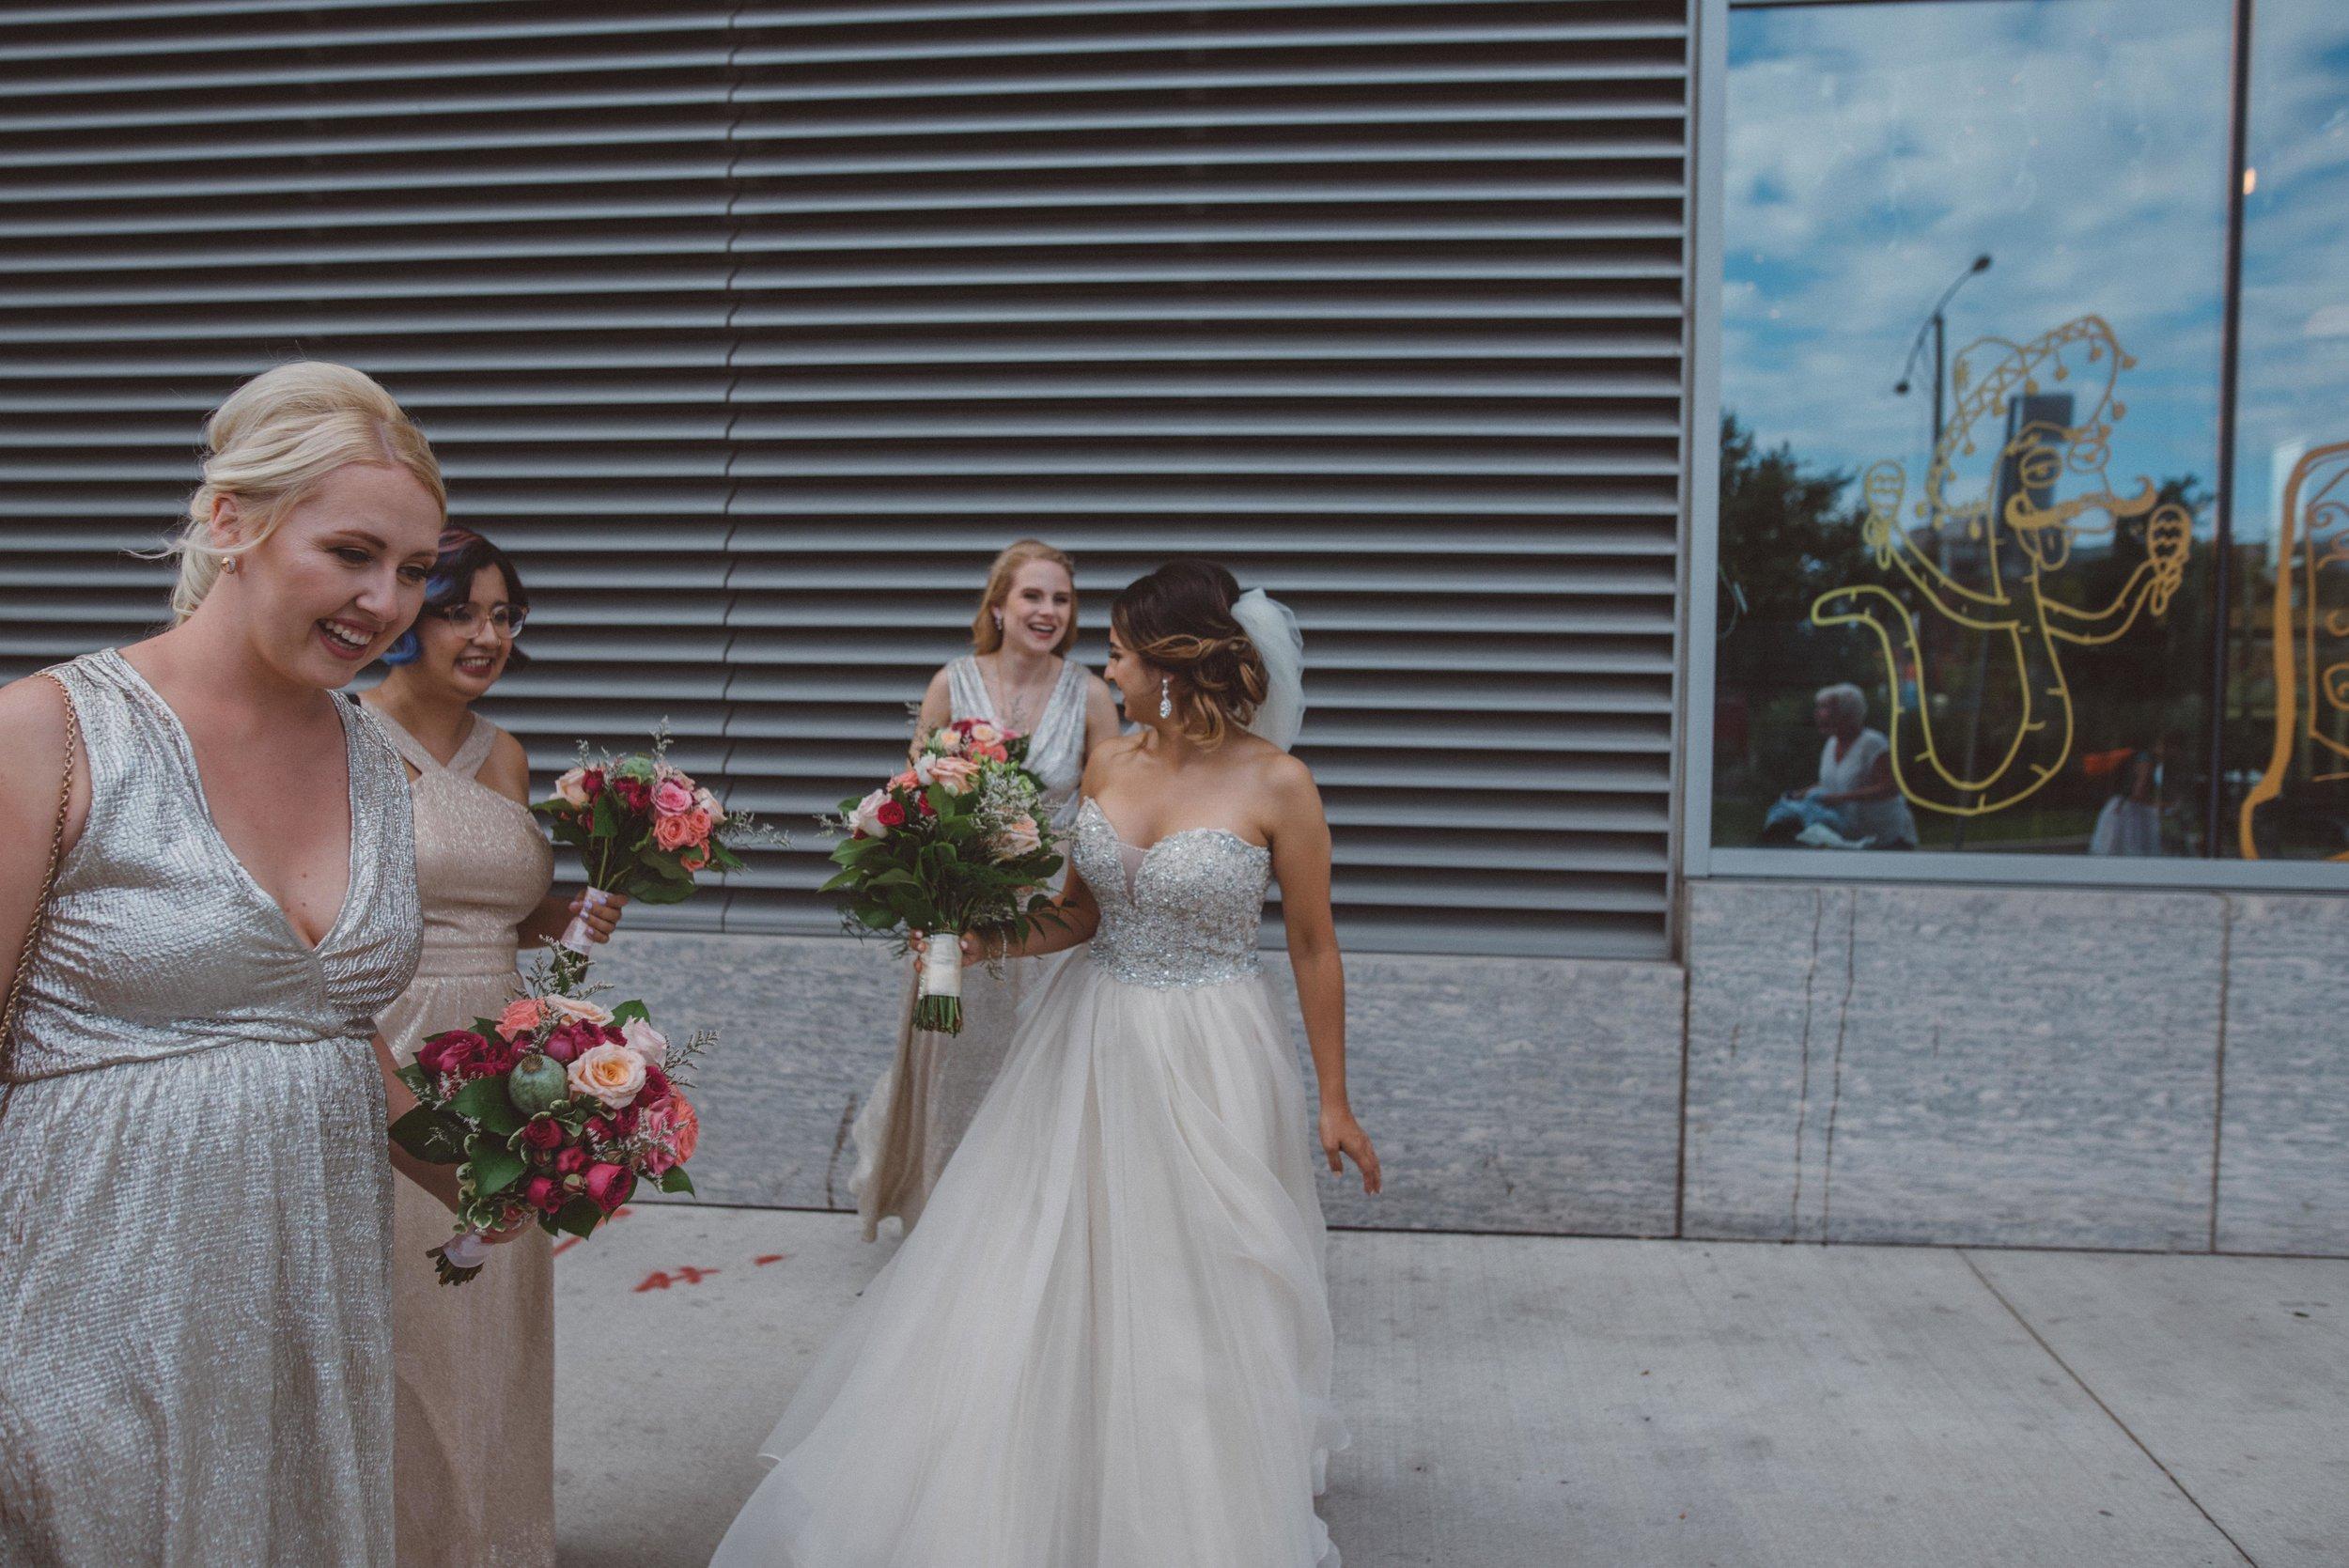 mariage_photographe_toronto_gatineau_ottawa_photographer_wedding-53.jpg